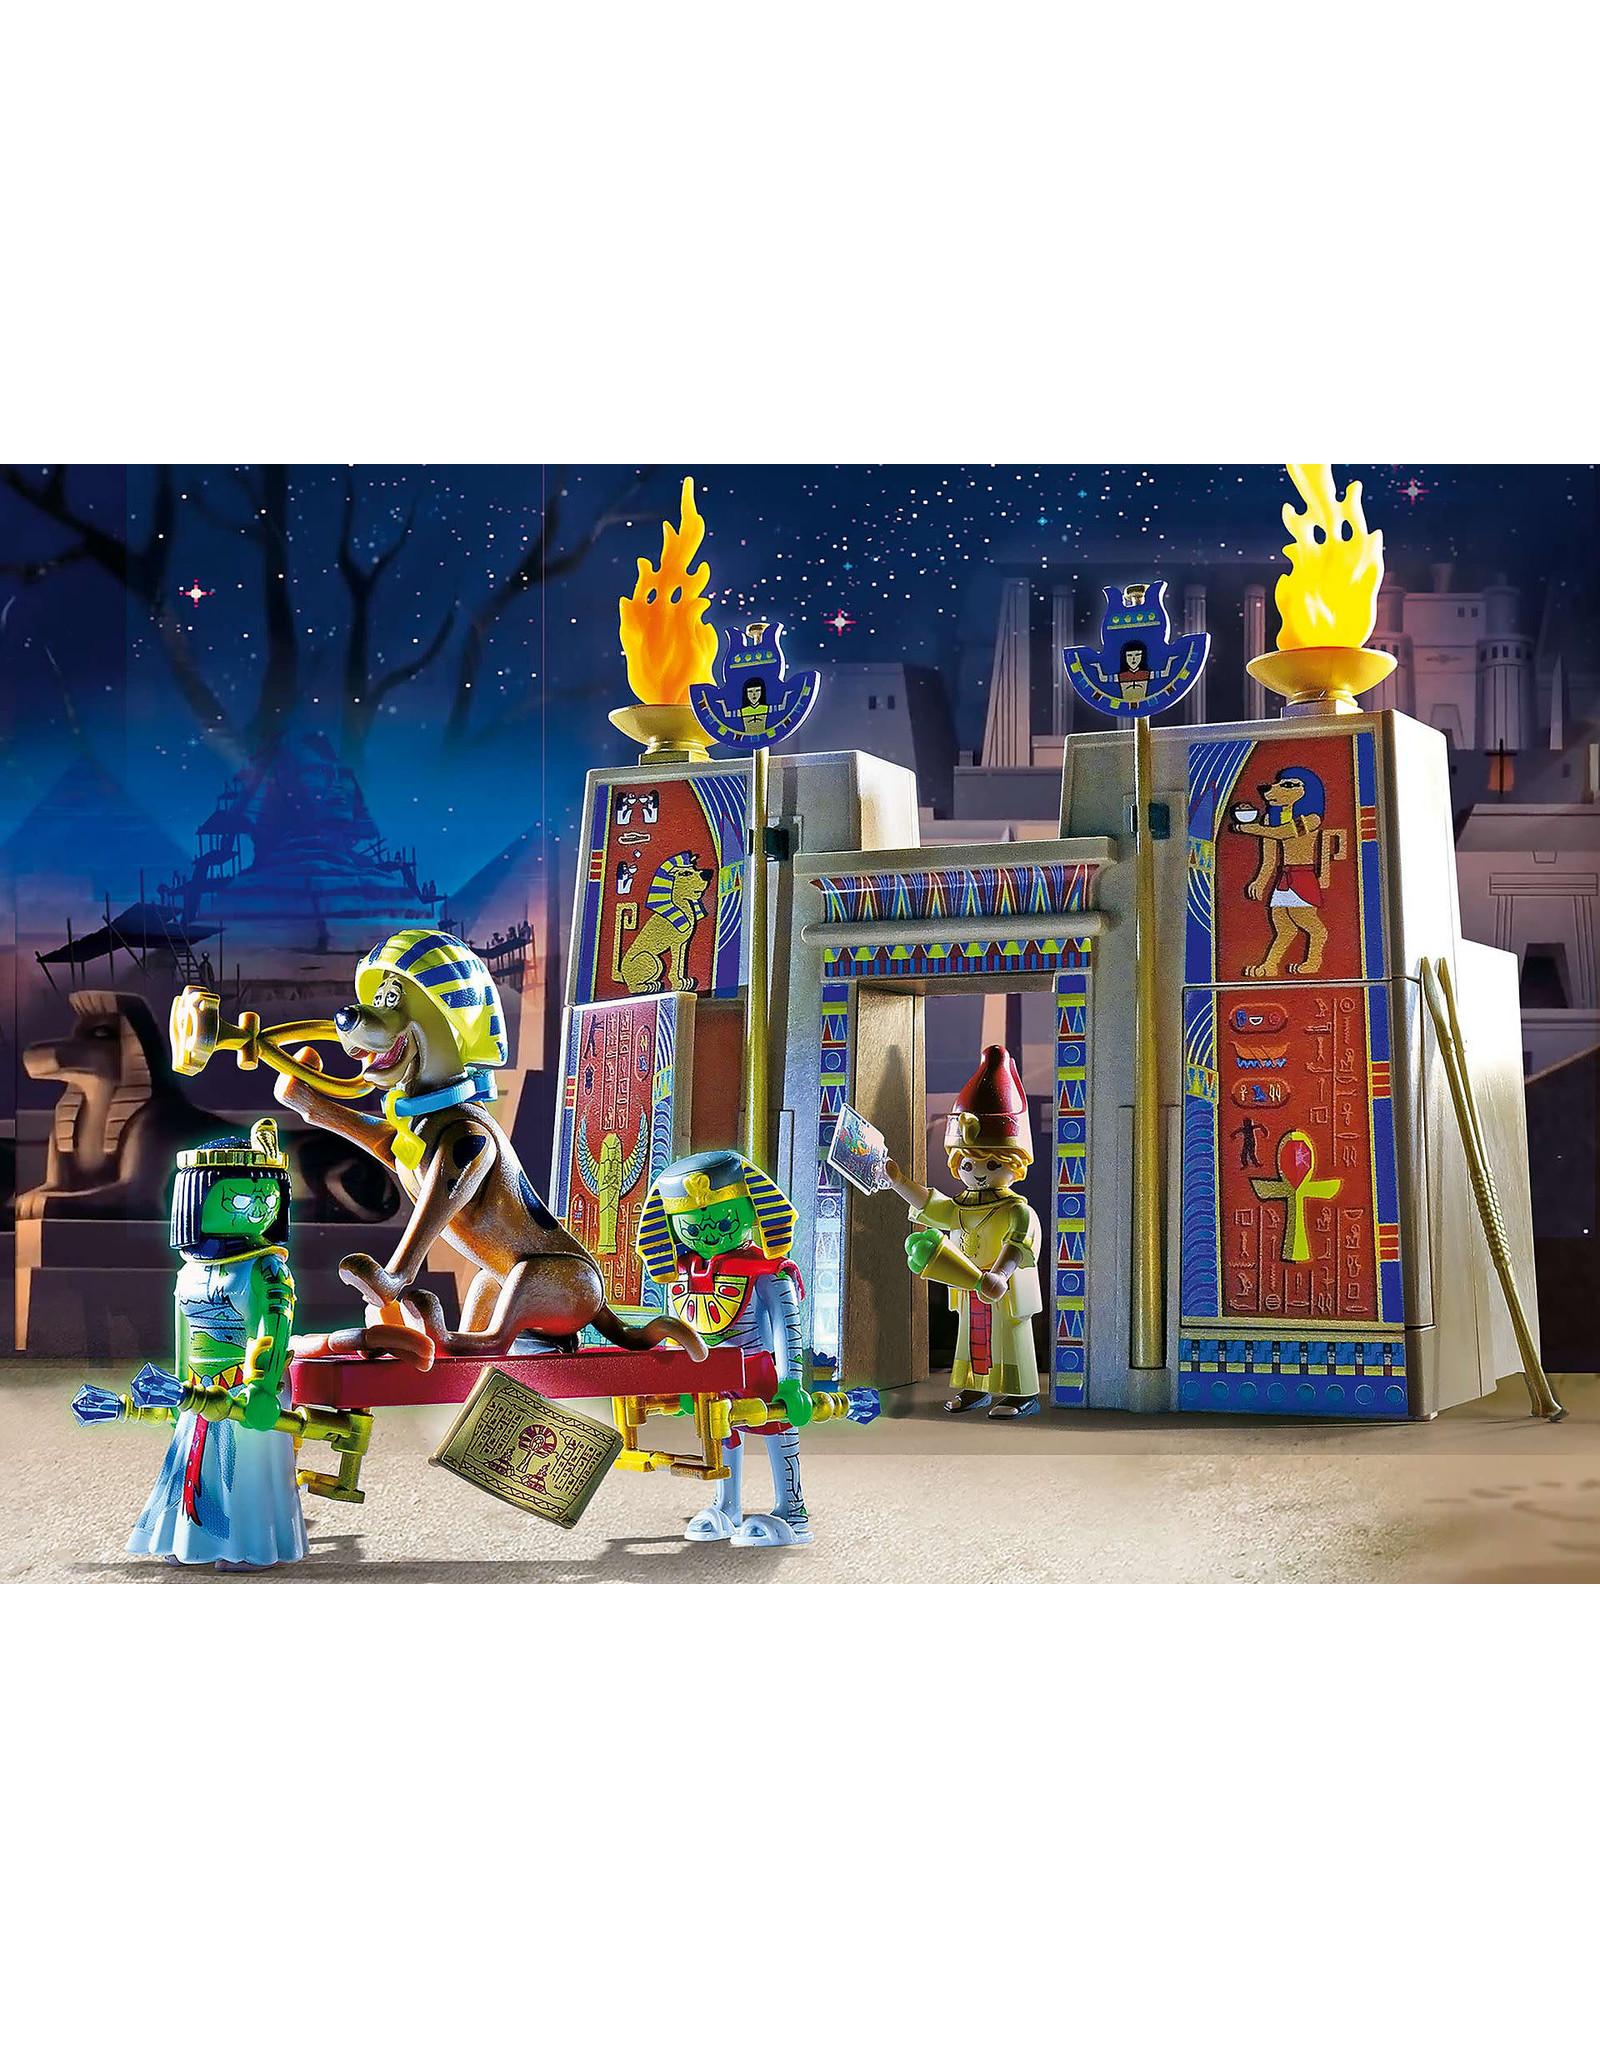 Playmobil Scooby Doo! Adventure in Egypt